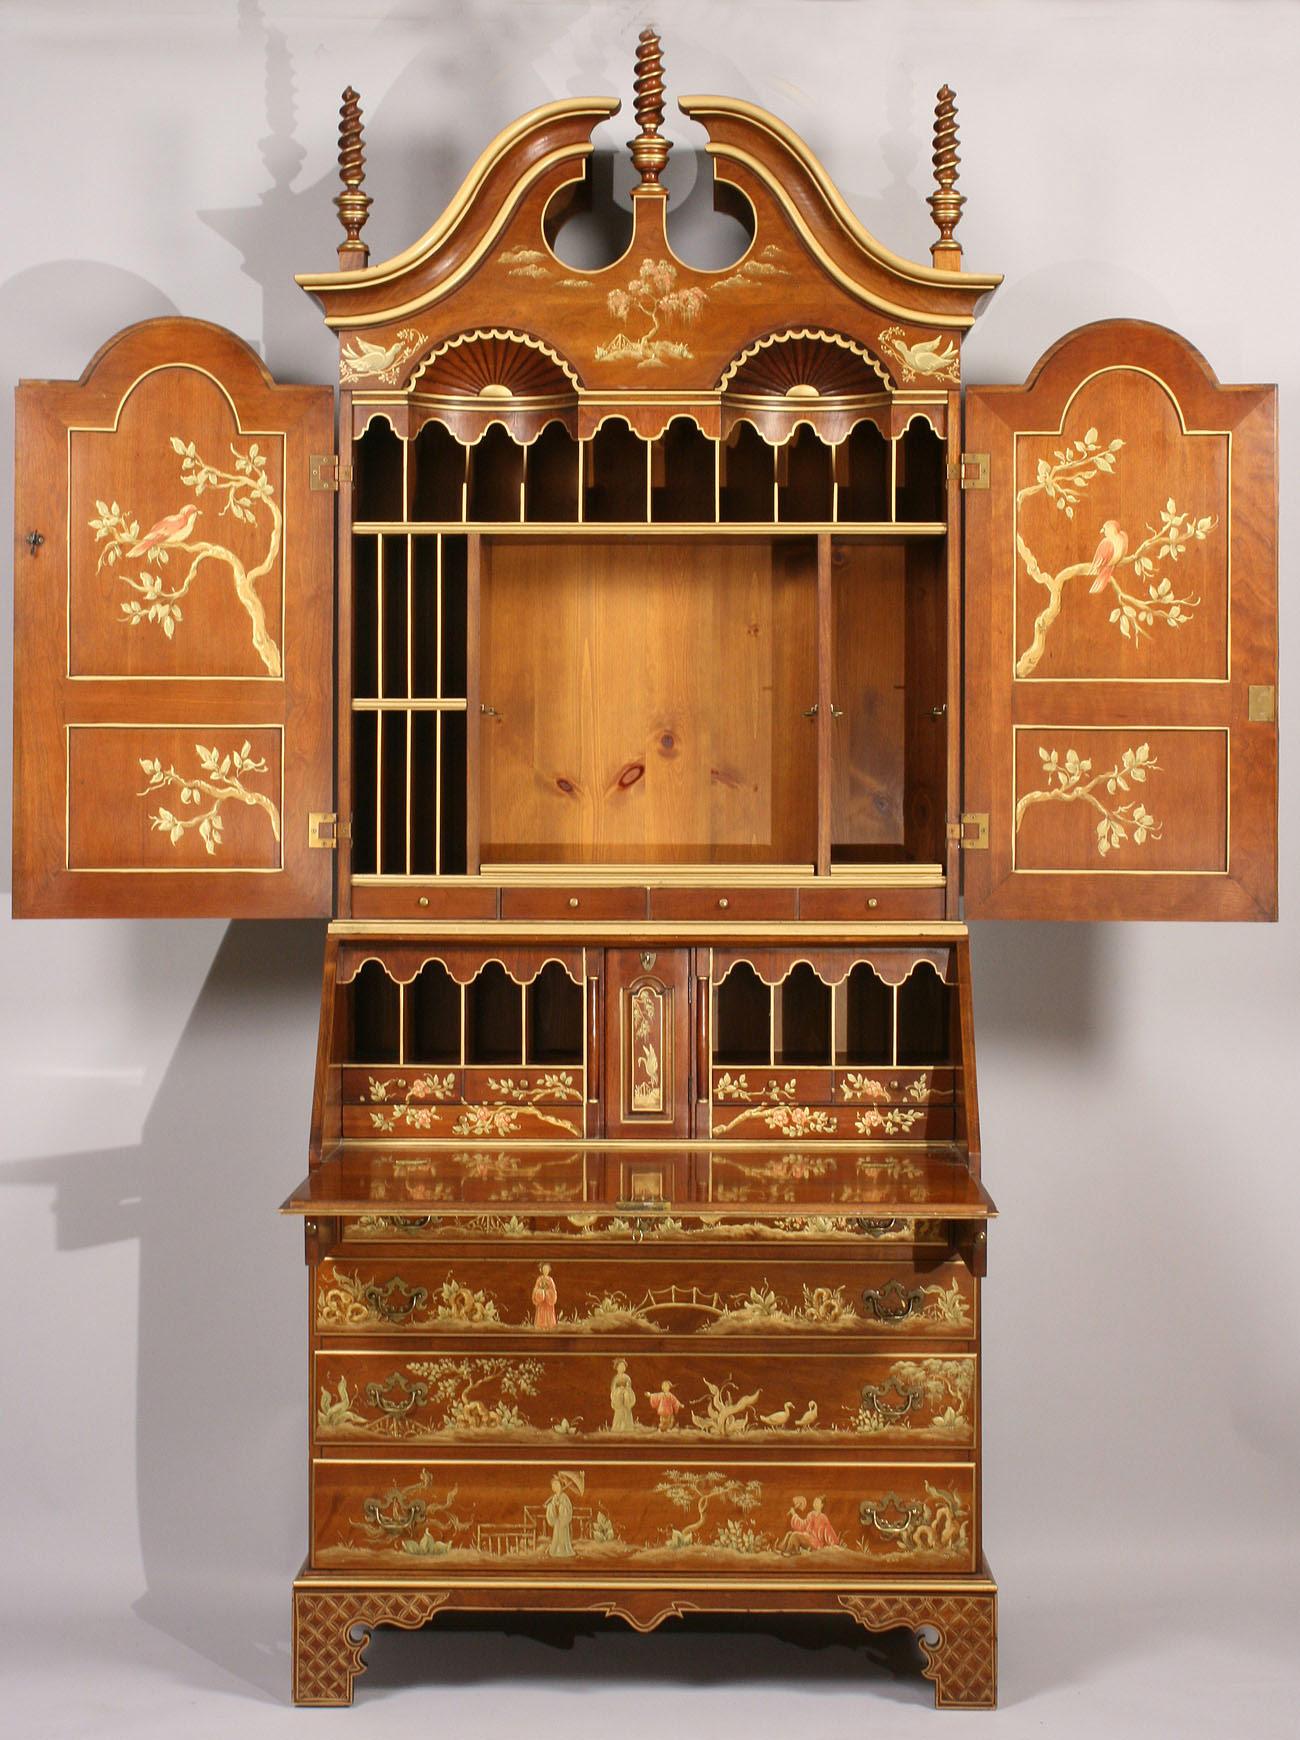 Lot 440 Chinoiserie Secretary Bookcase